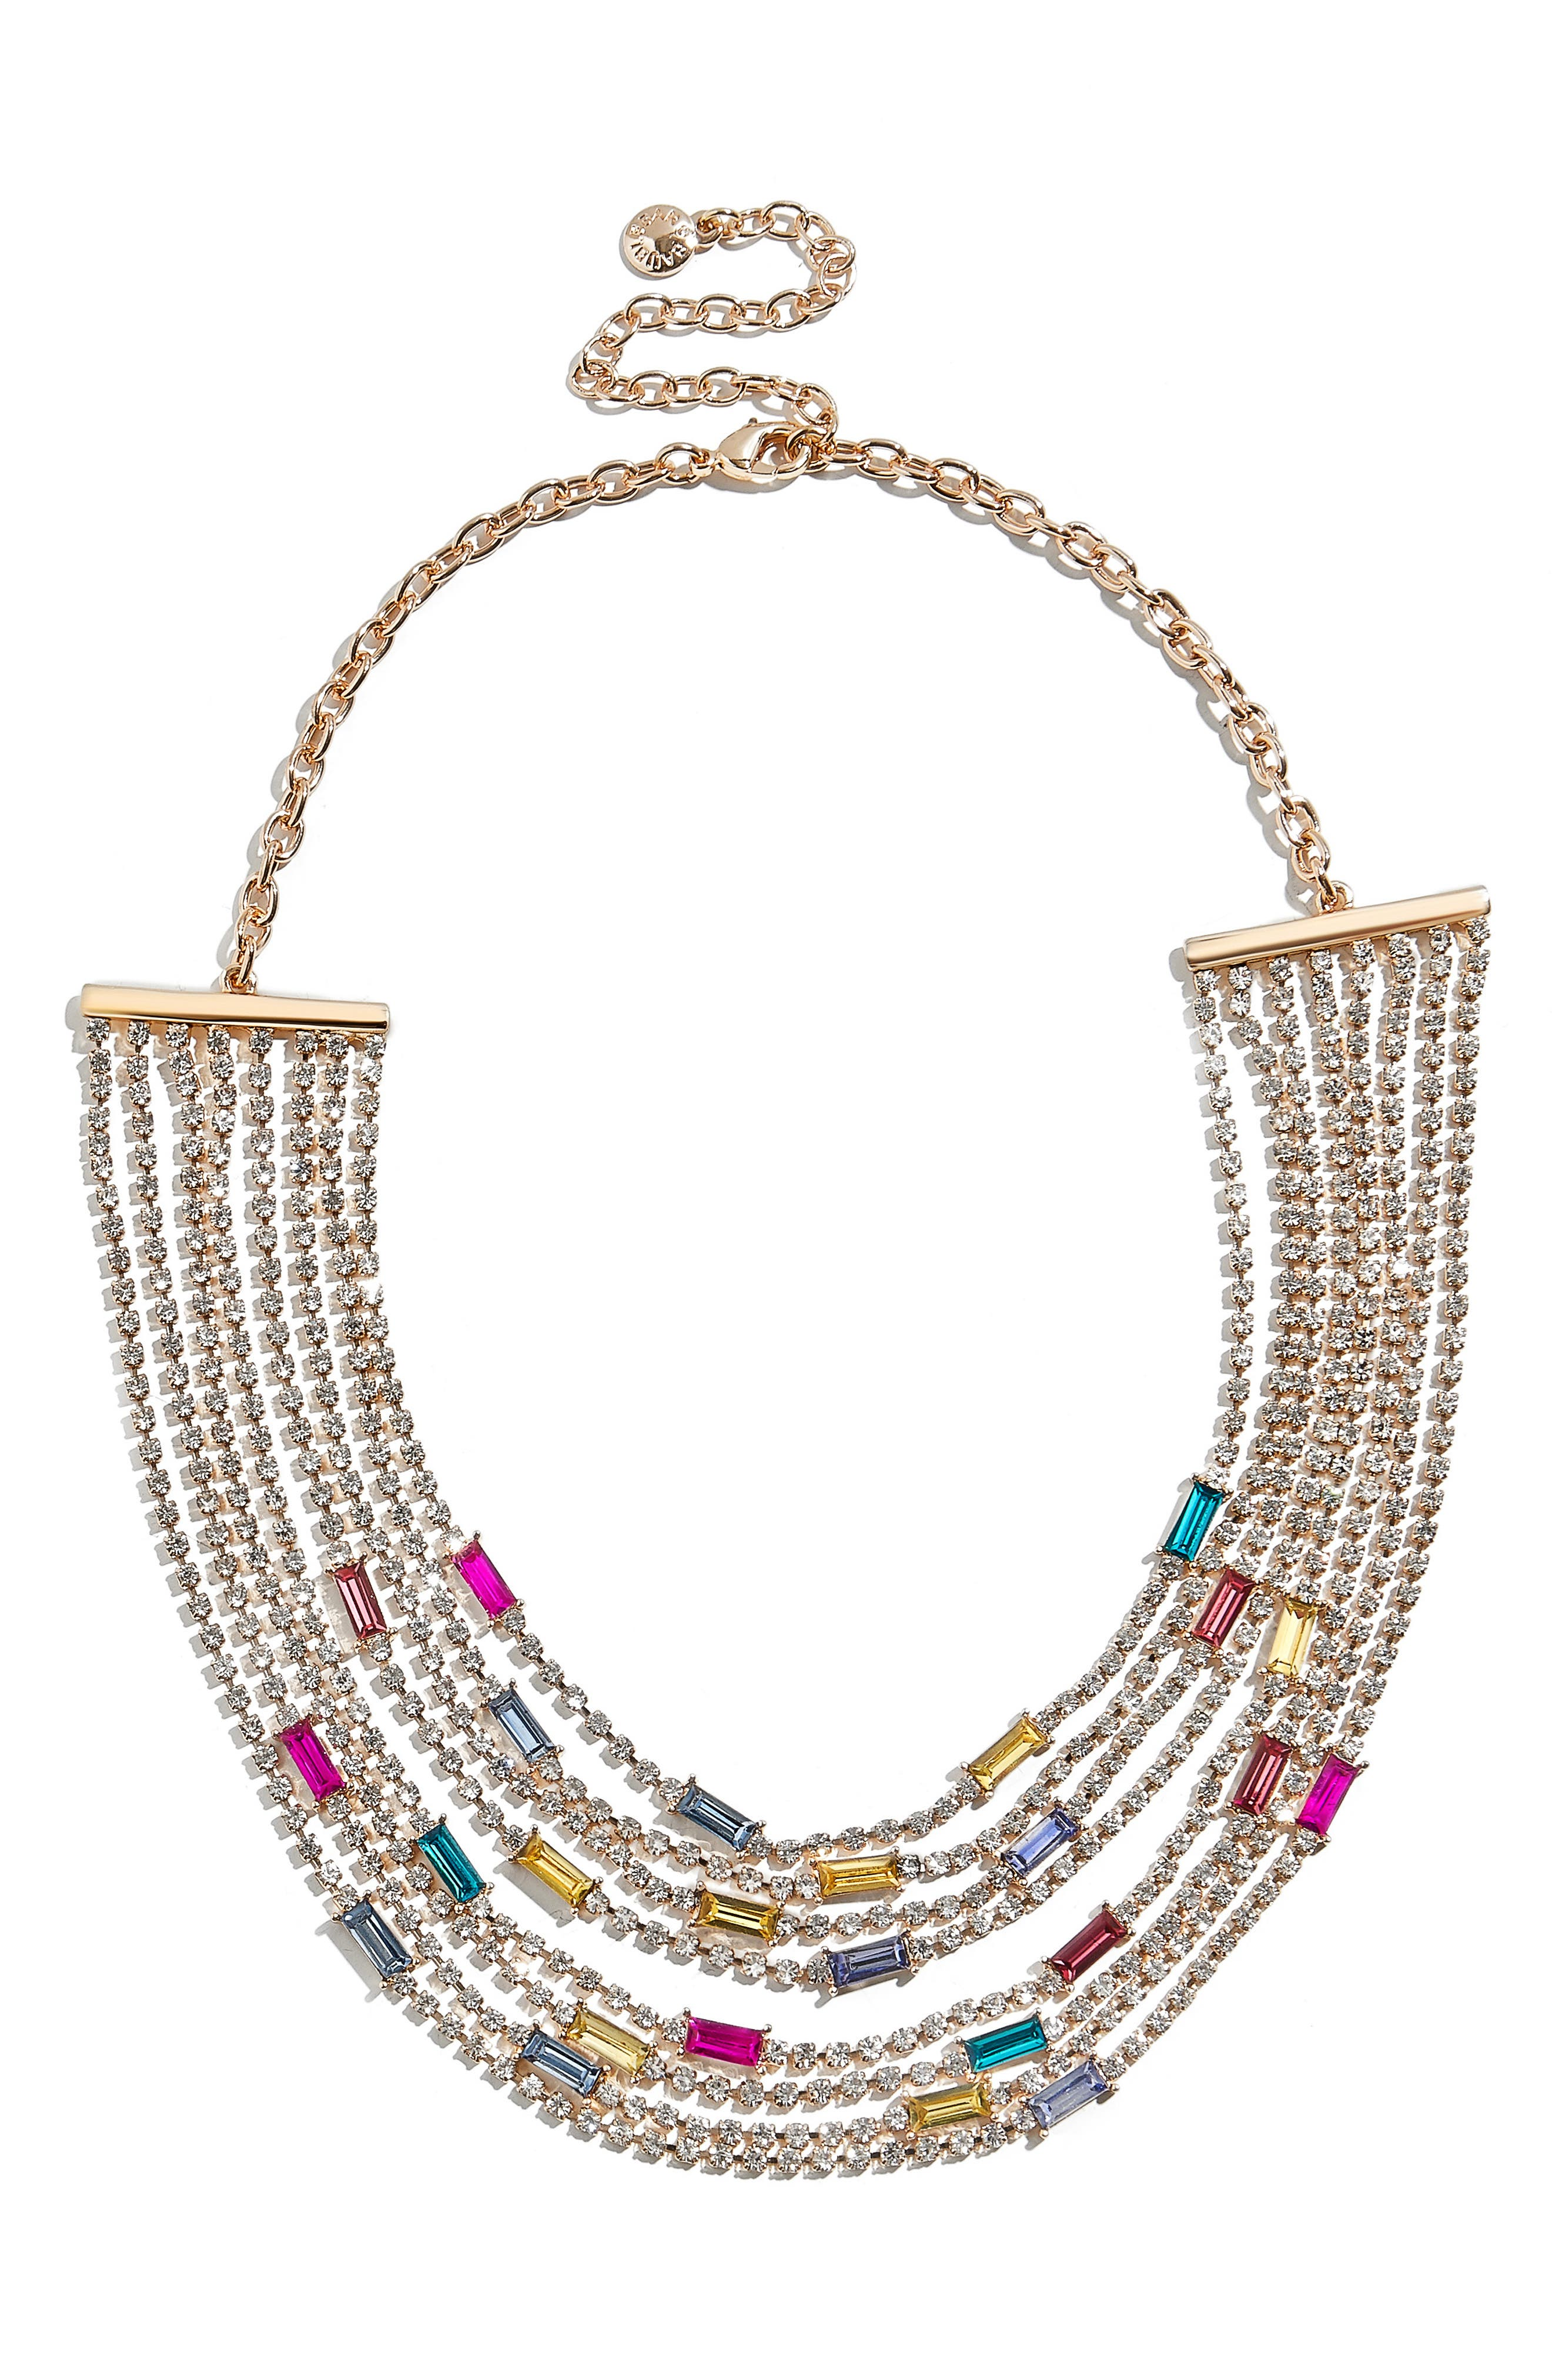 x Micaela Erlanger Bright Lights, Big City Statement Necklace,                         Main,                         color, MULTI/ GOLD